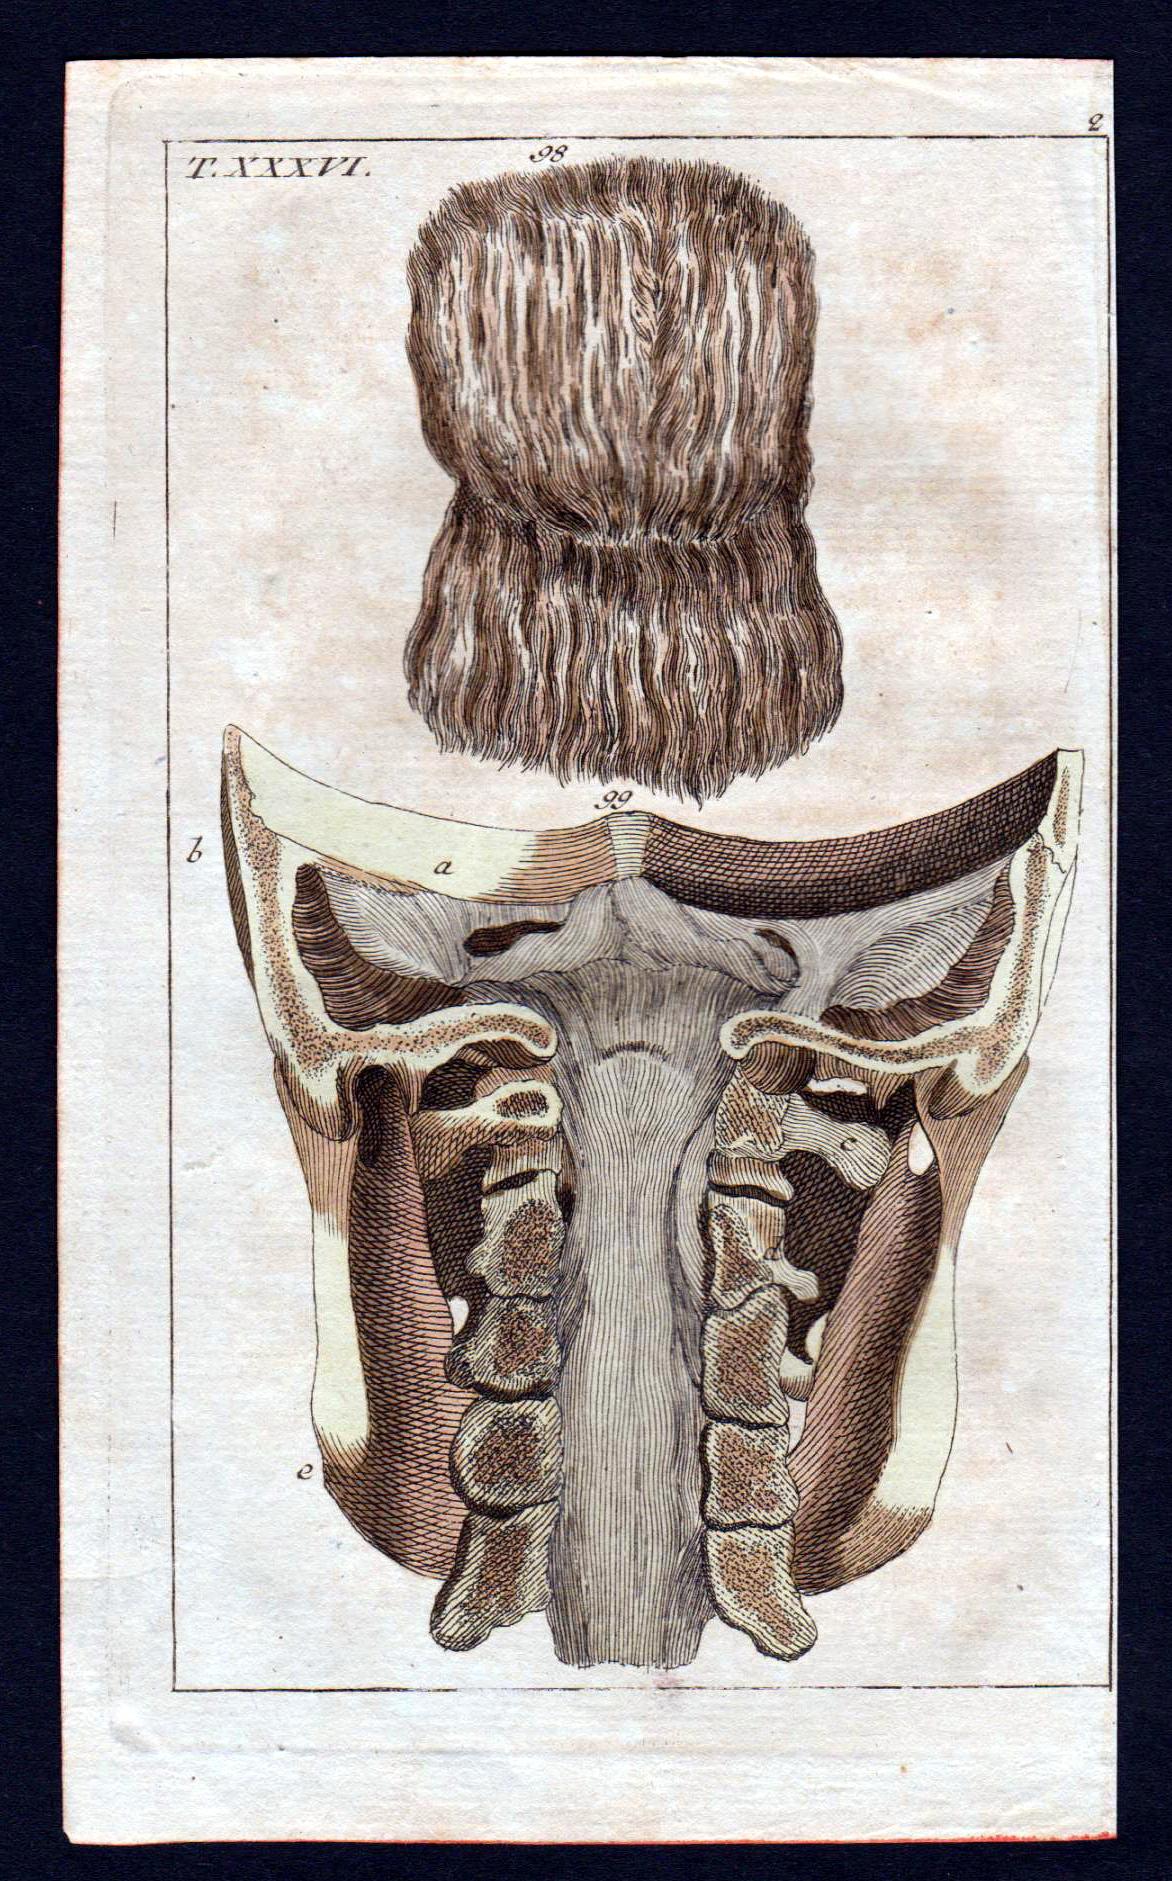 cervical vertebra Halswirbel Anatomie anatomy Medizin medicine ...